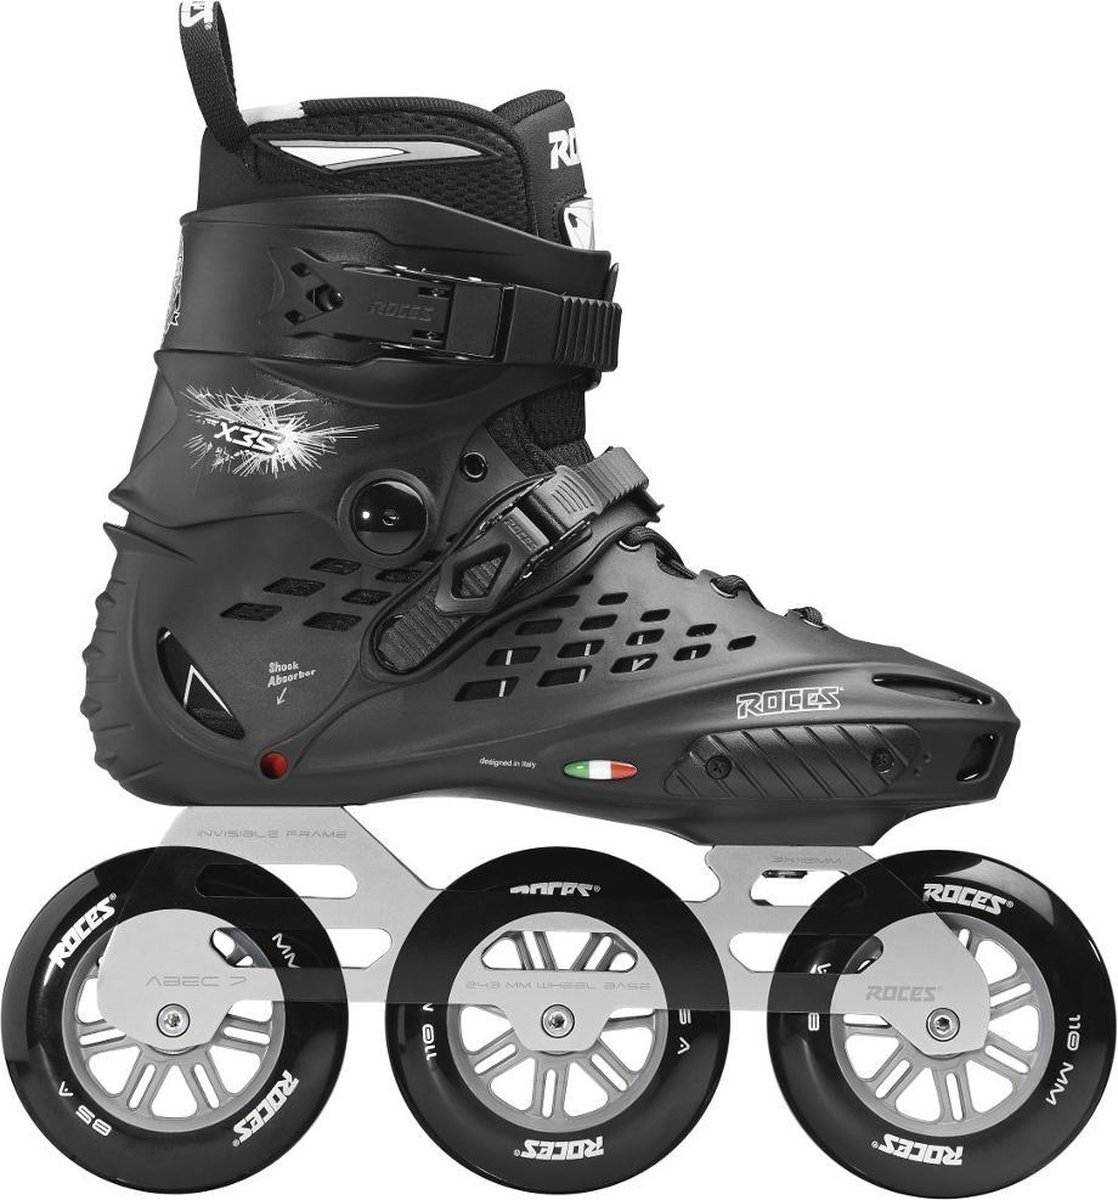 Roces X35 inline skates 110 mm black / silver